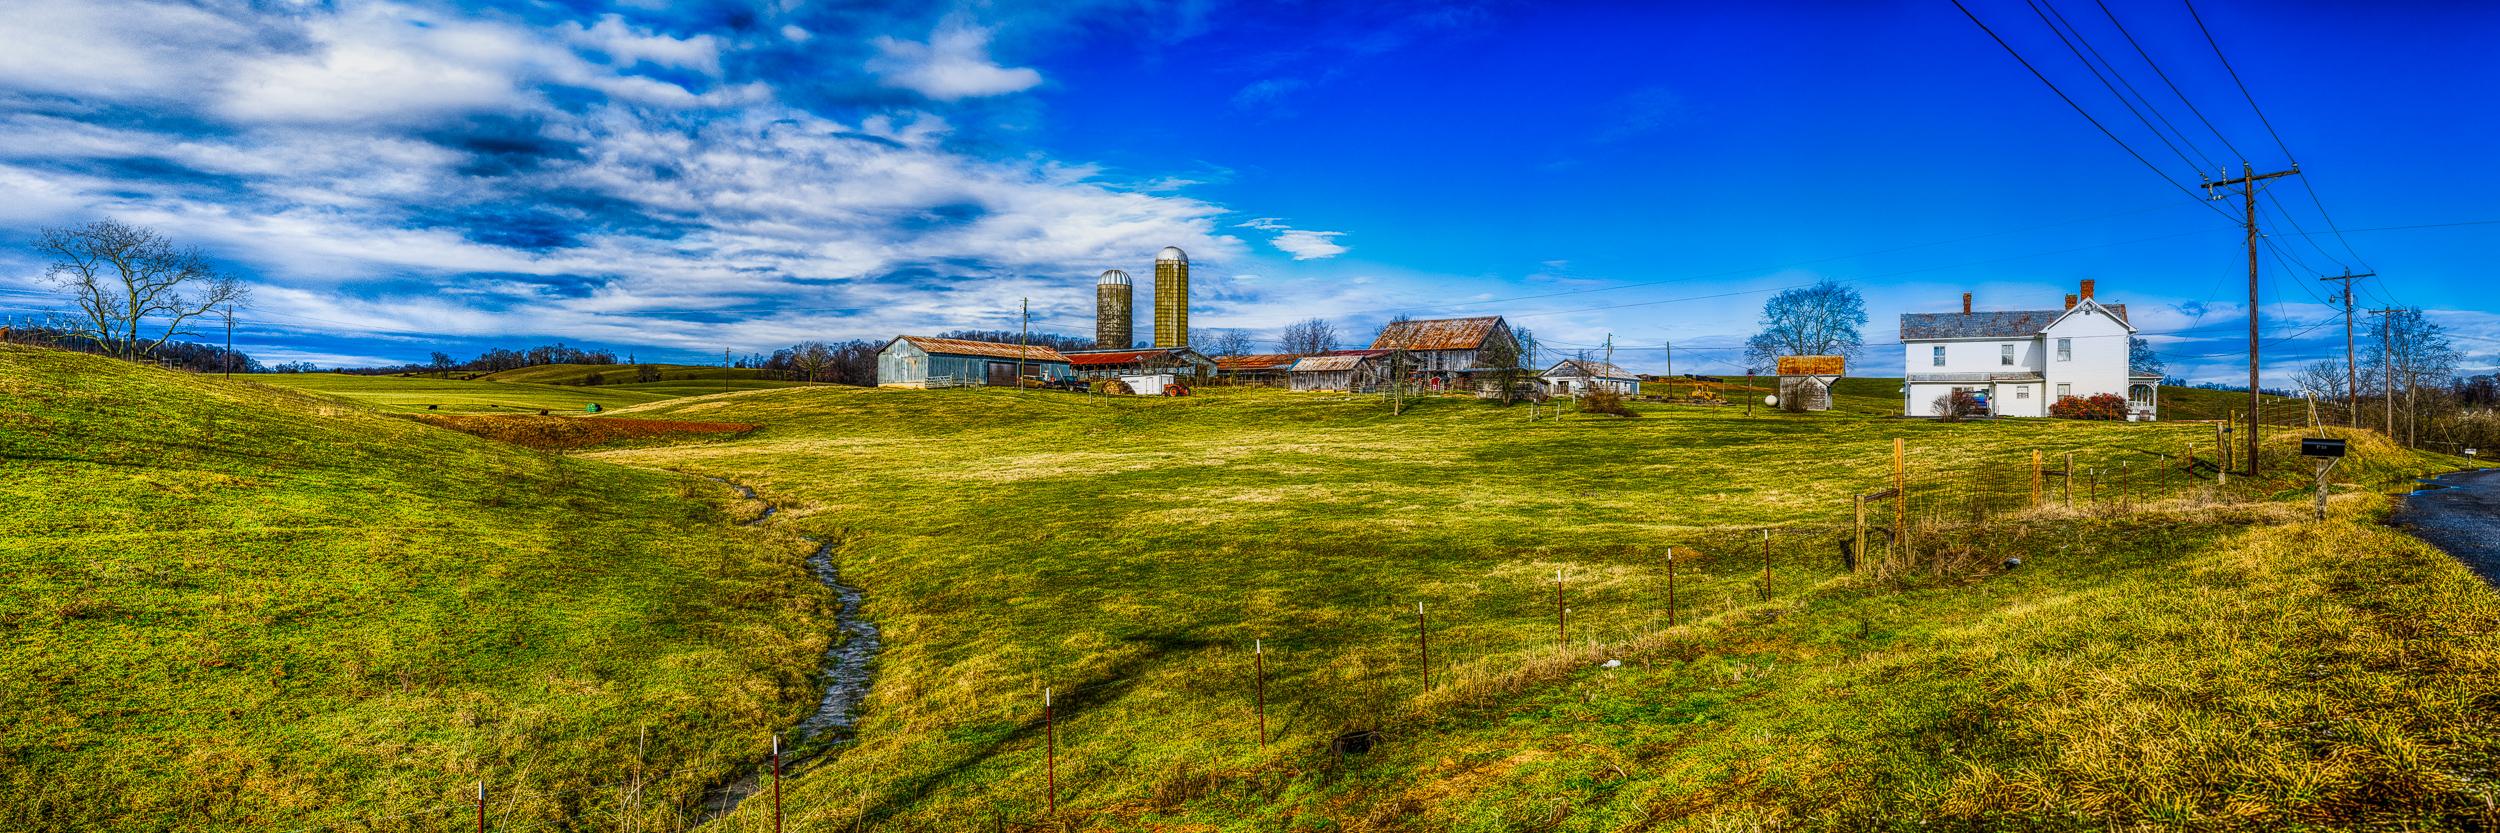 Willow Branch Farm